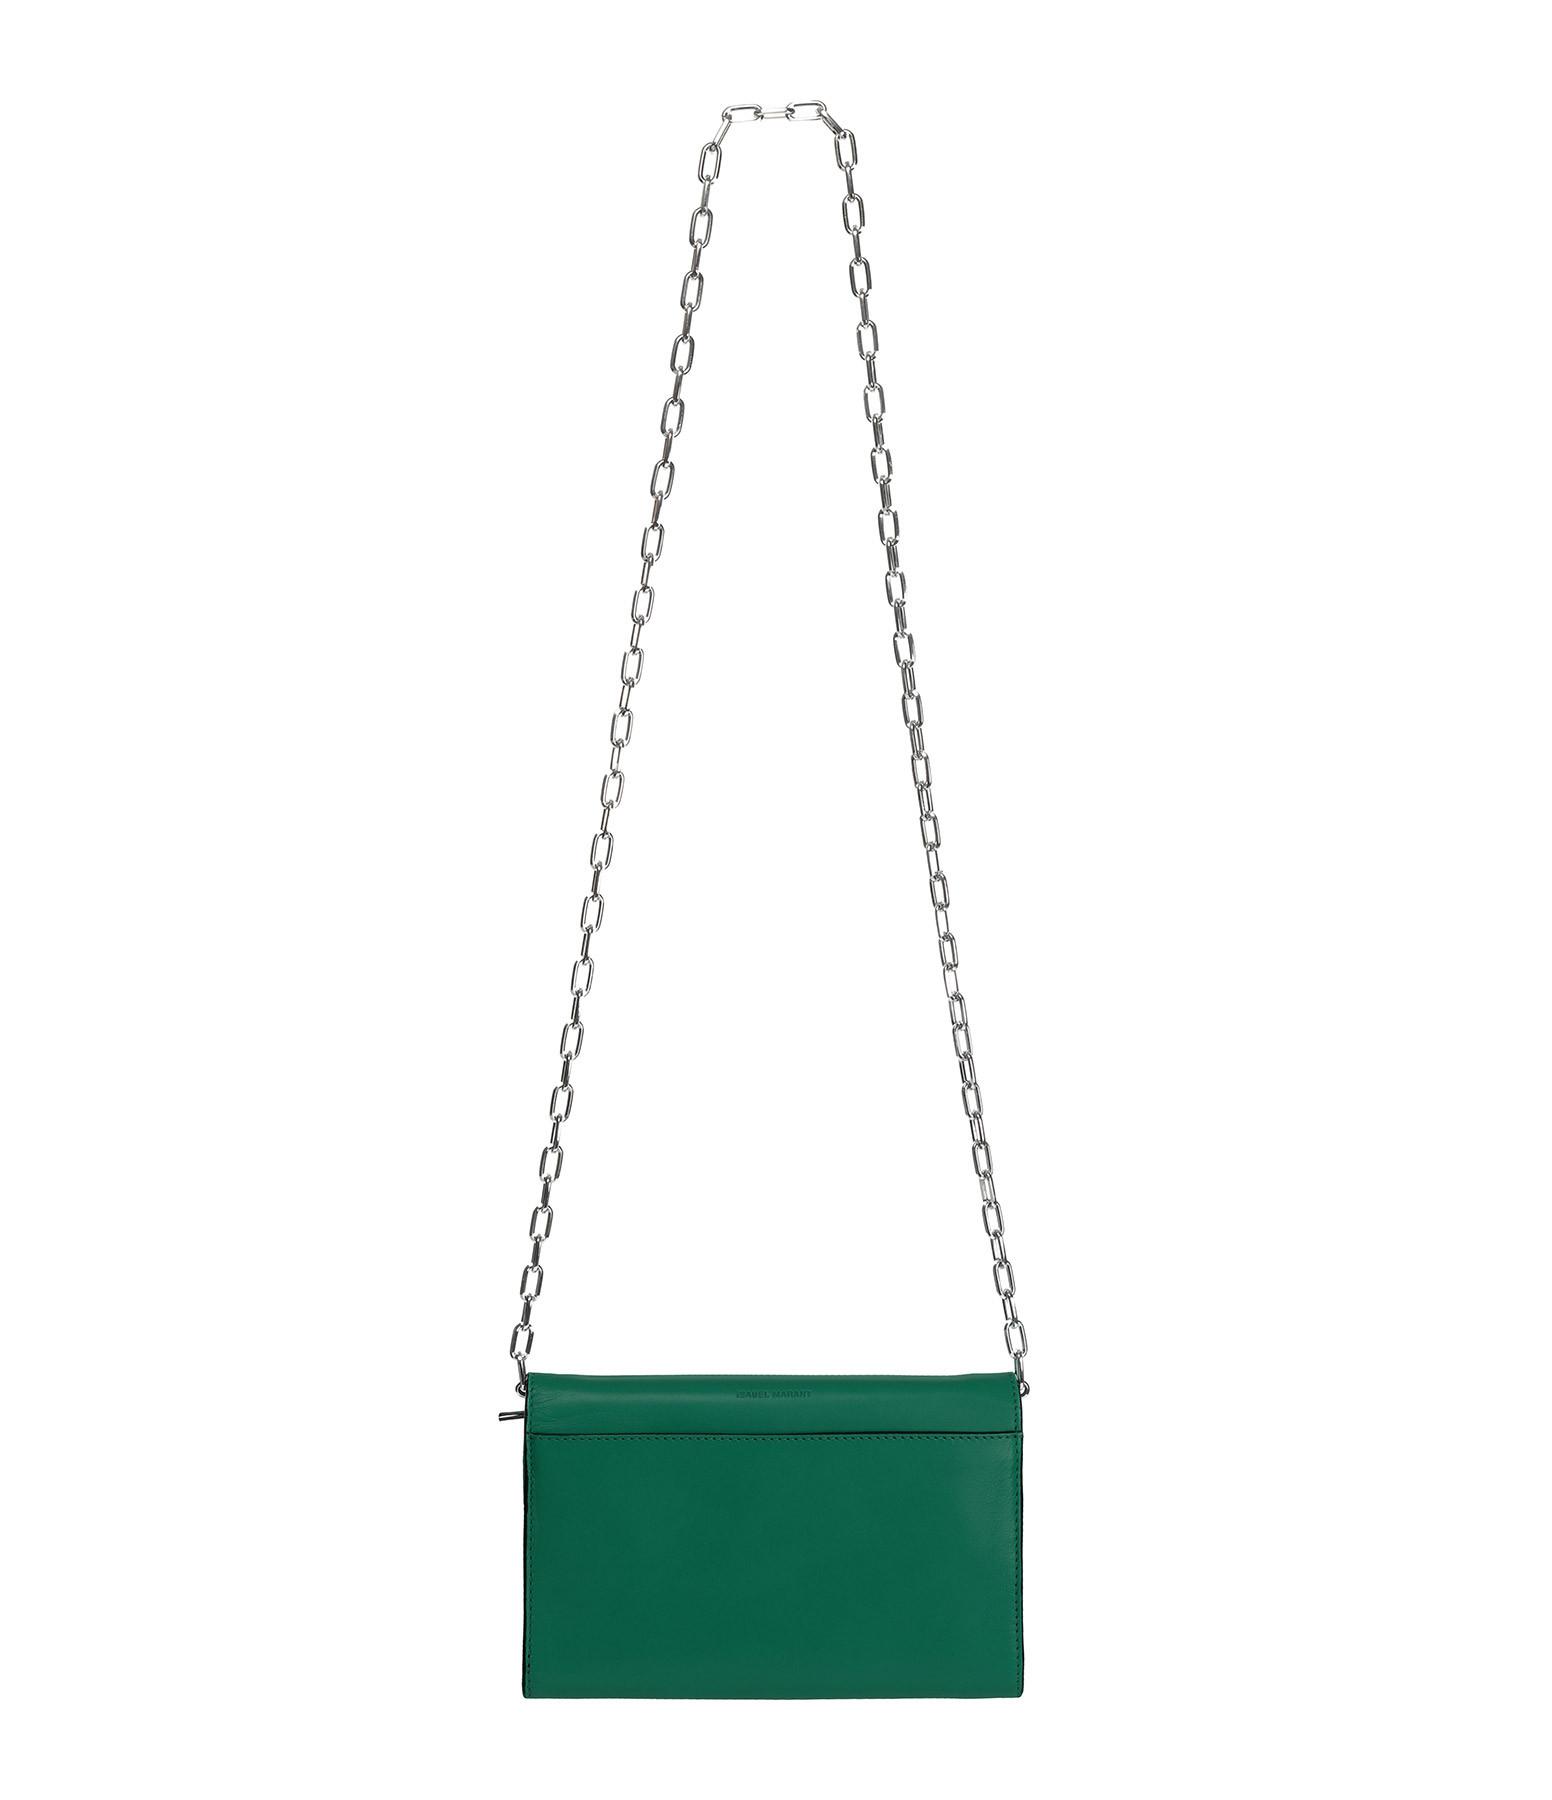 ISABEL MARANT - Sac Bandoulière Kyloe Cuir Vert